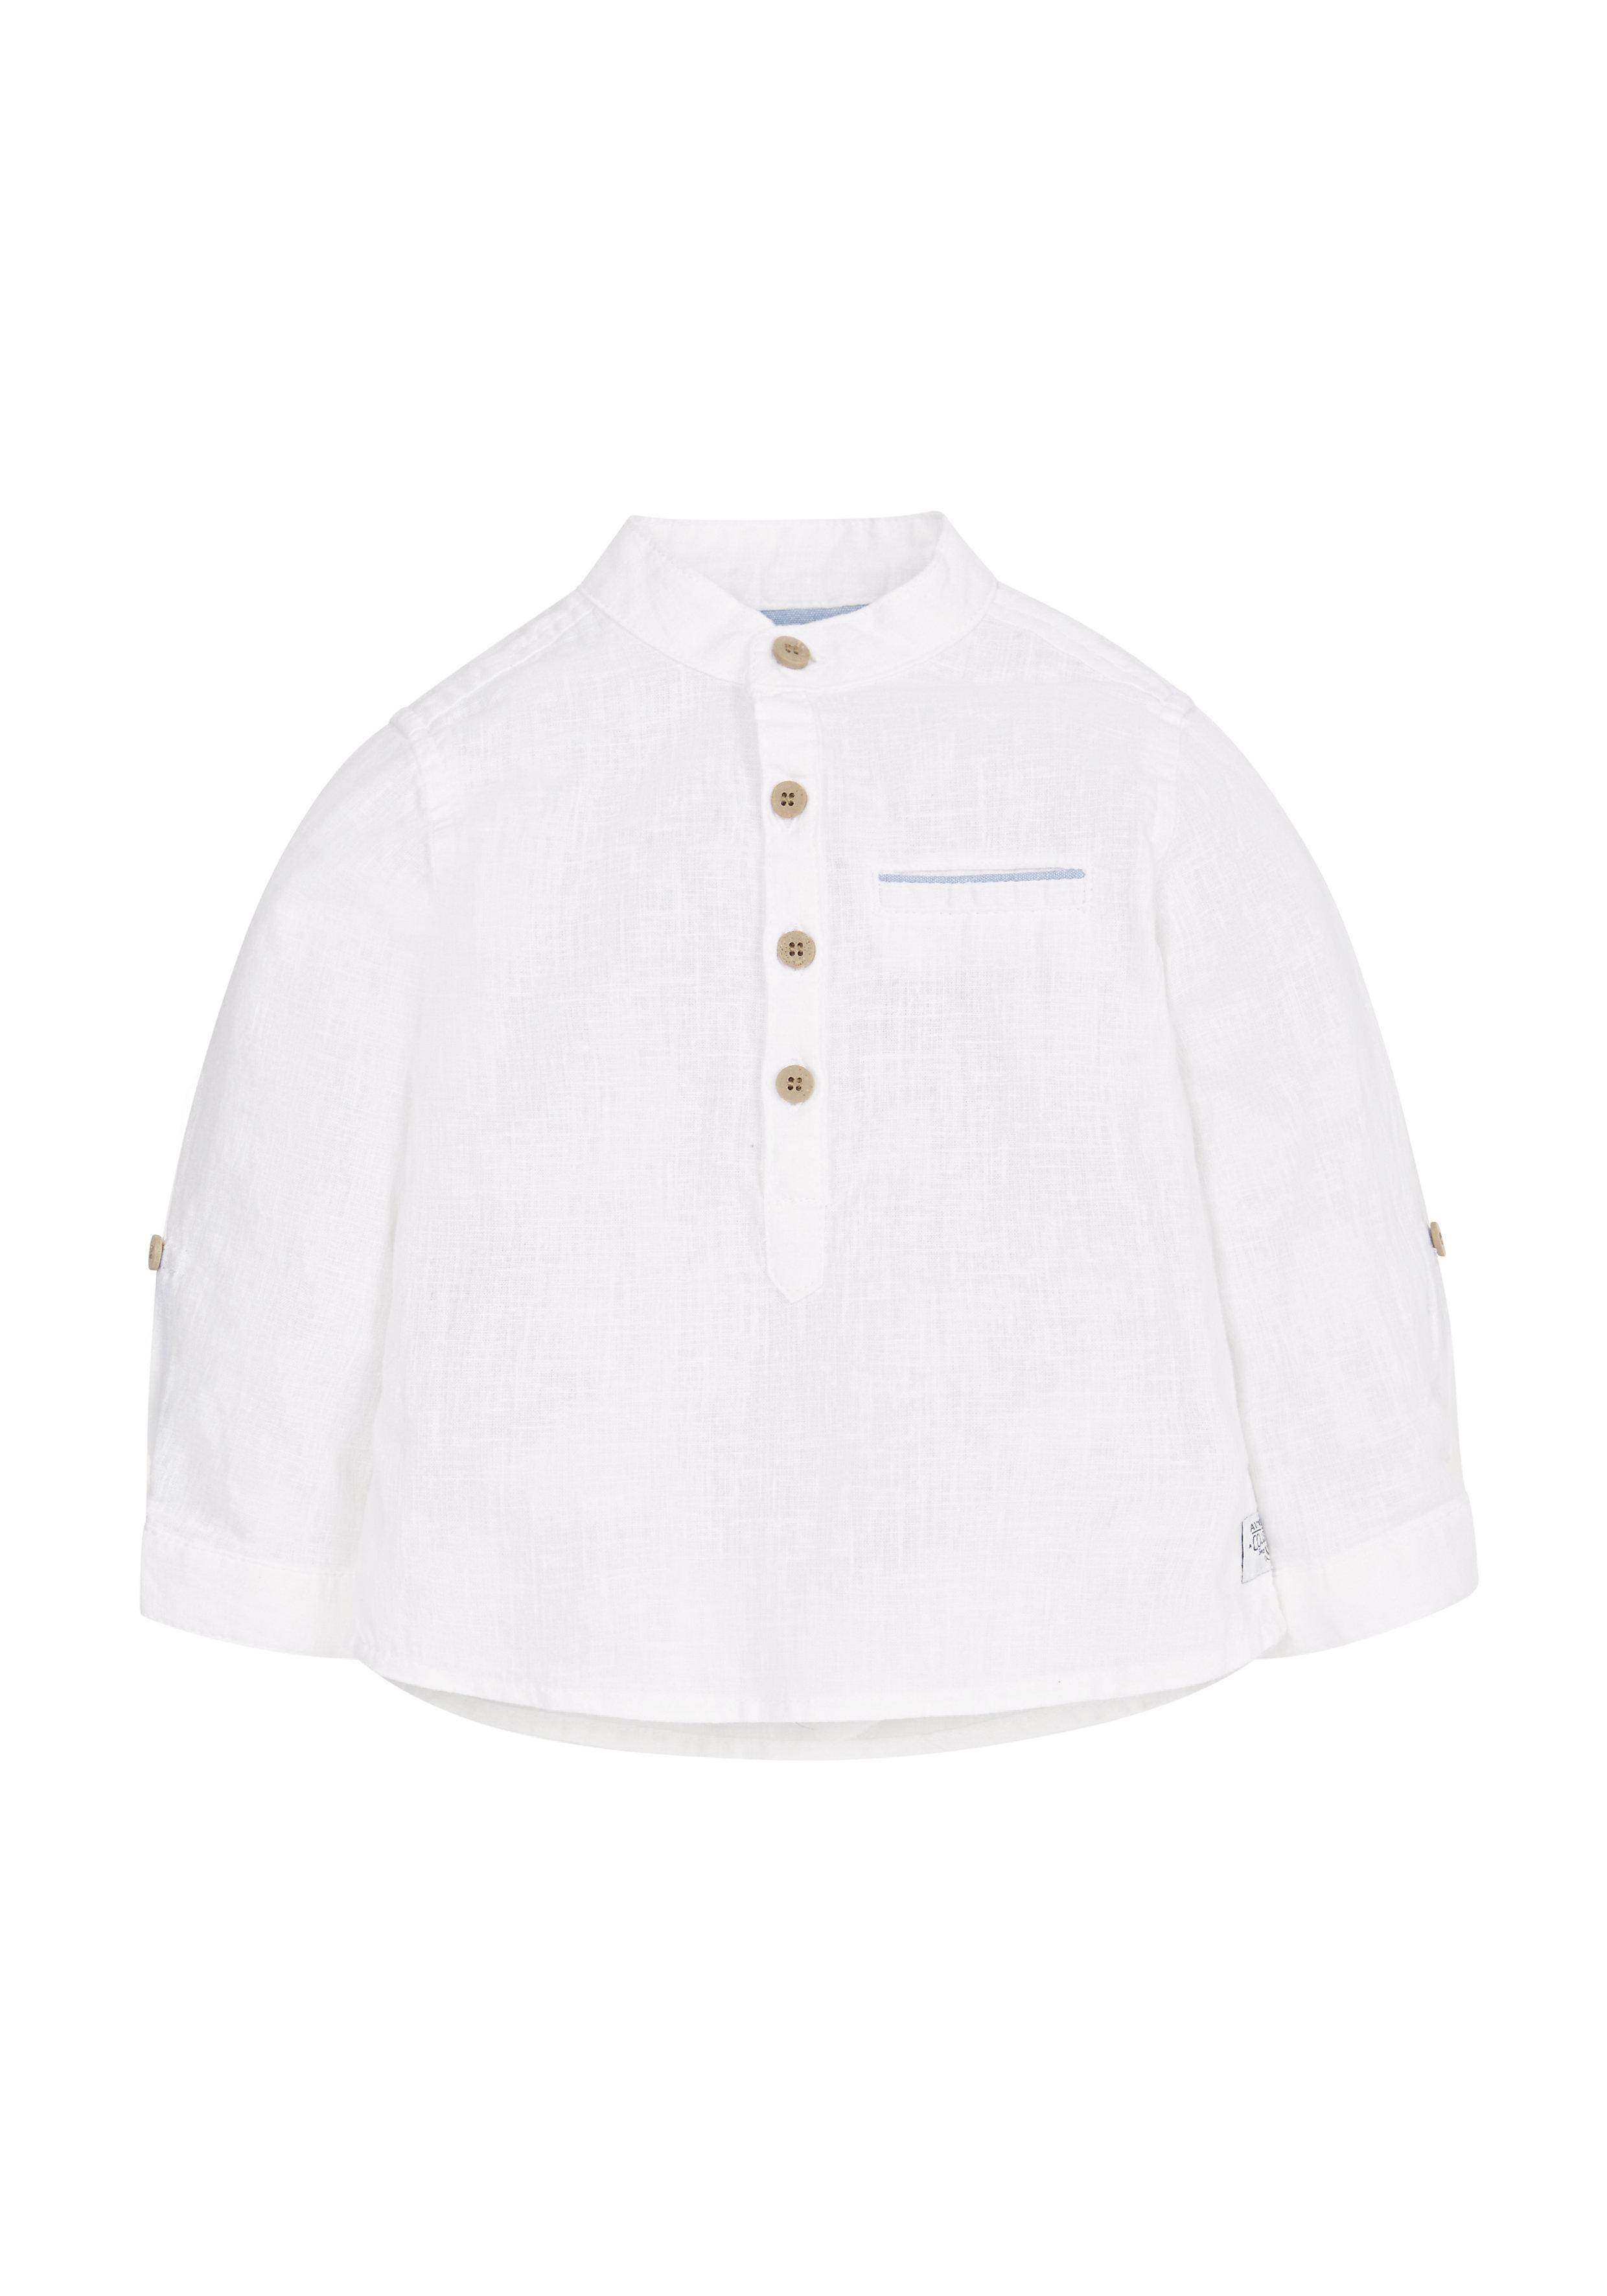 Mothercare | Boys Full Sleeves Roll Up Shirt - White